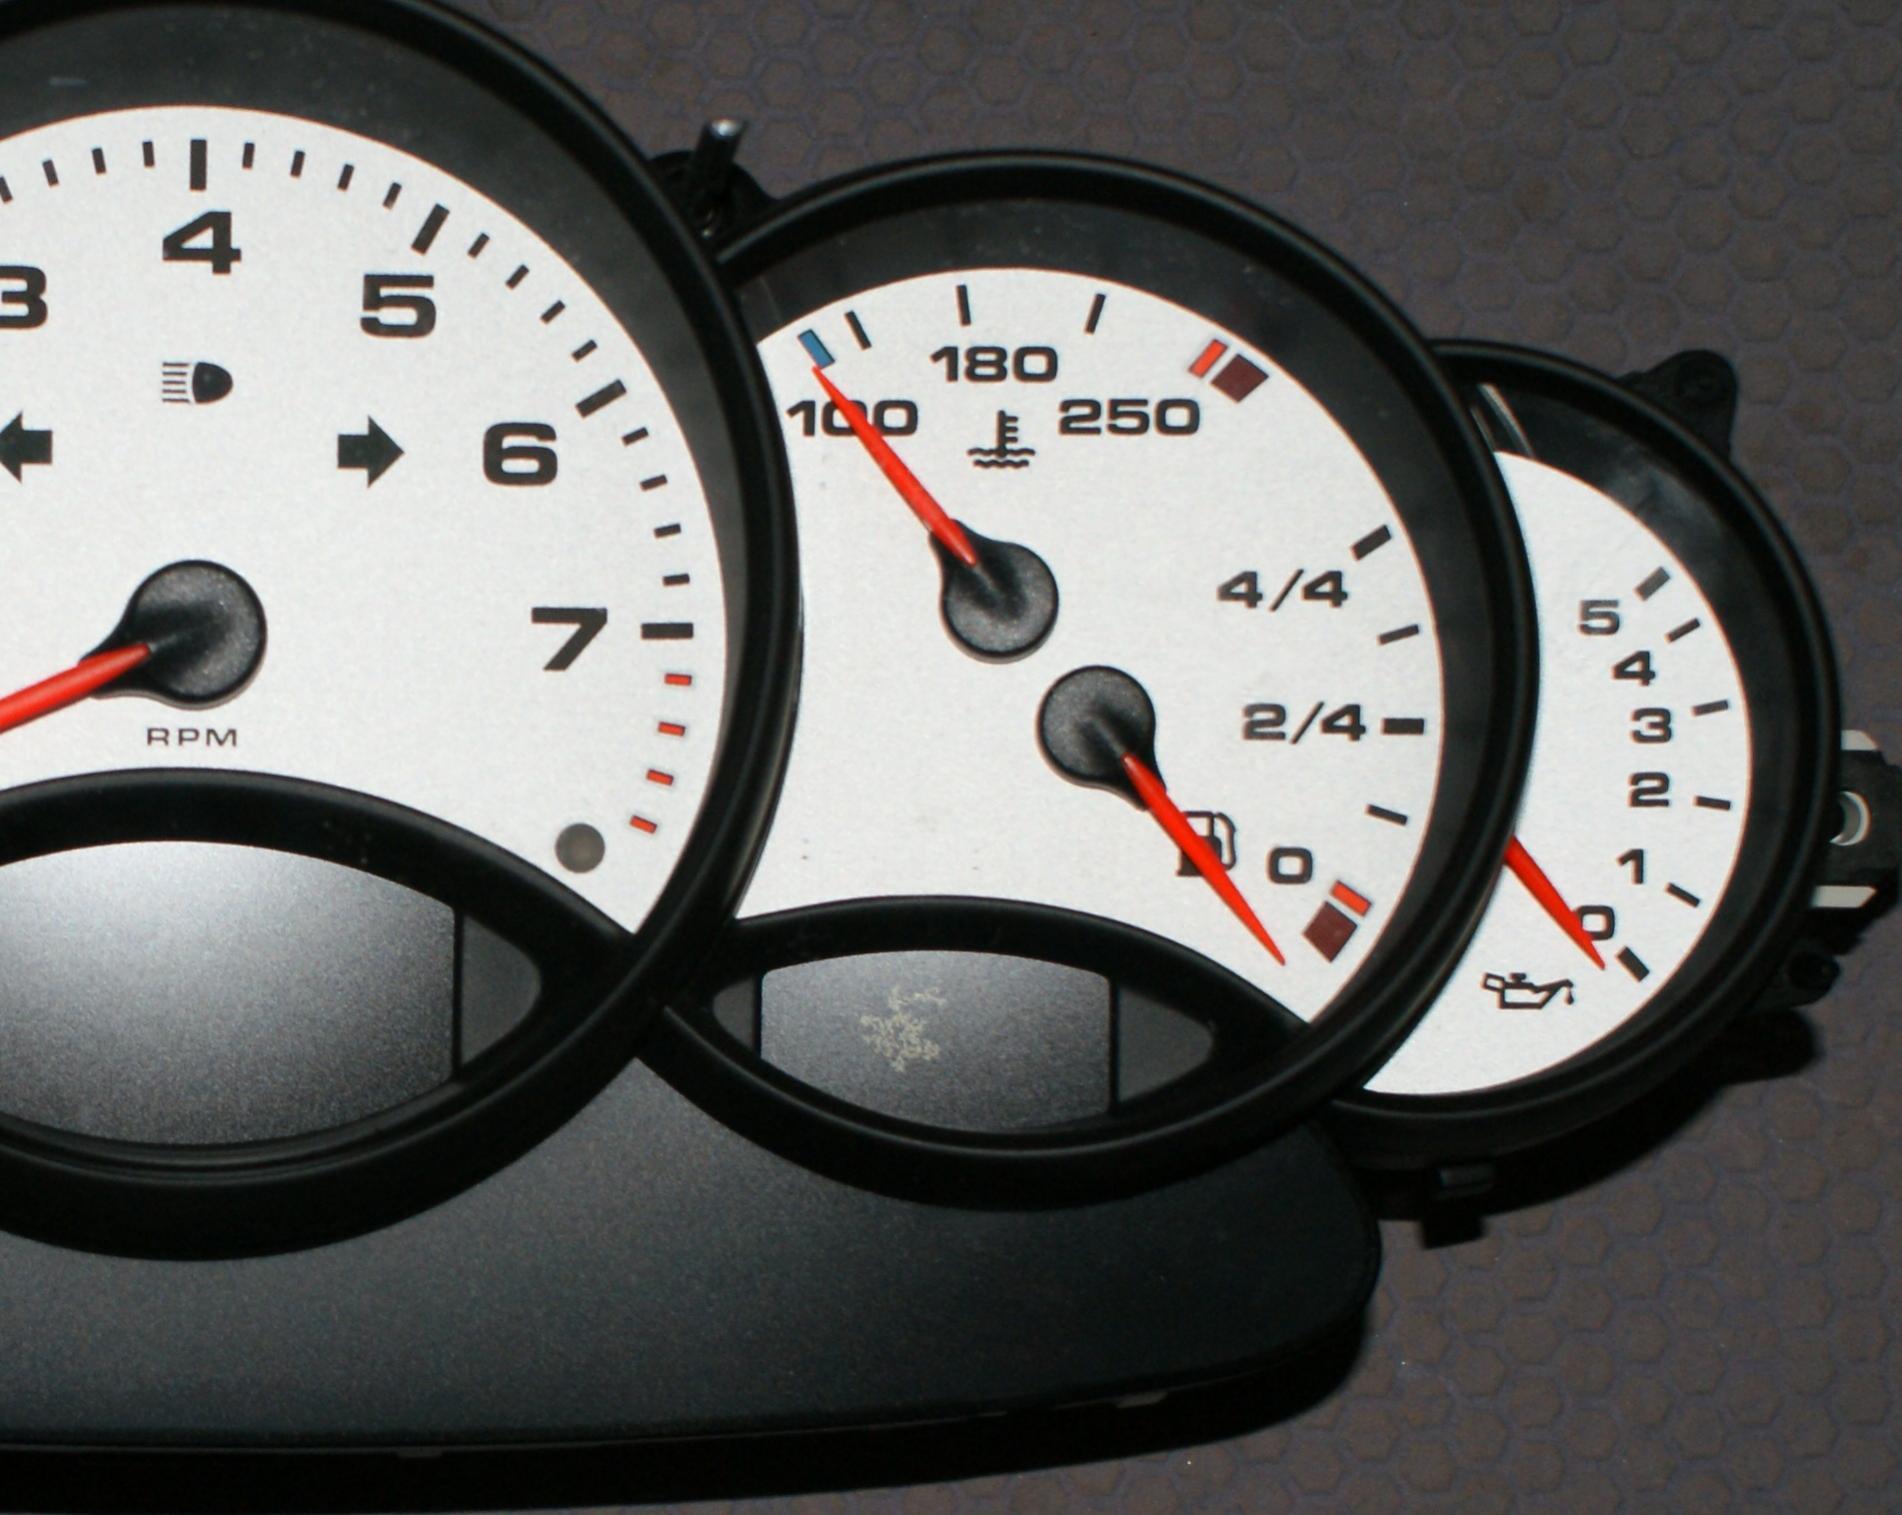 Gauge Cluster Repair 986 Forum For Porsche Boxster